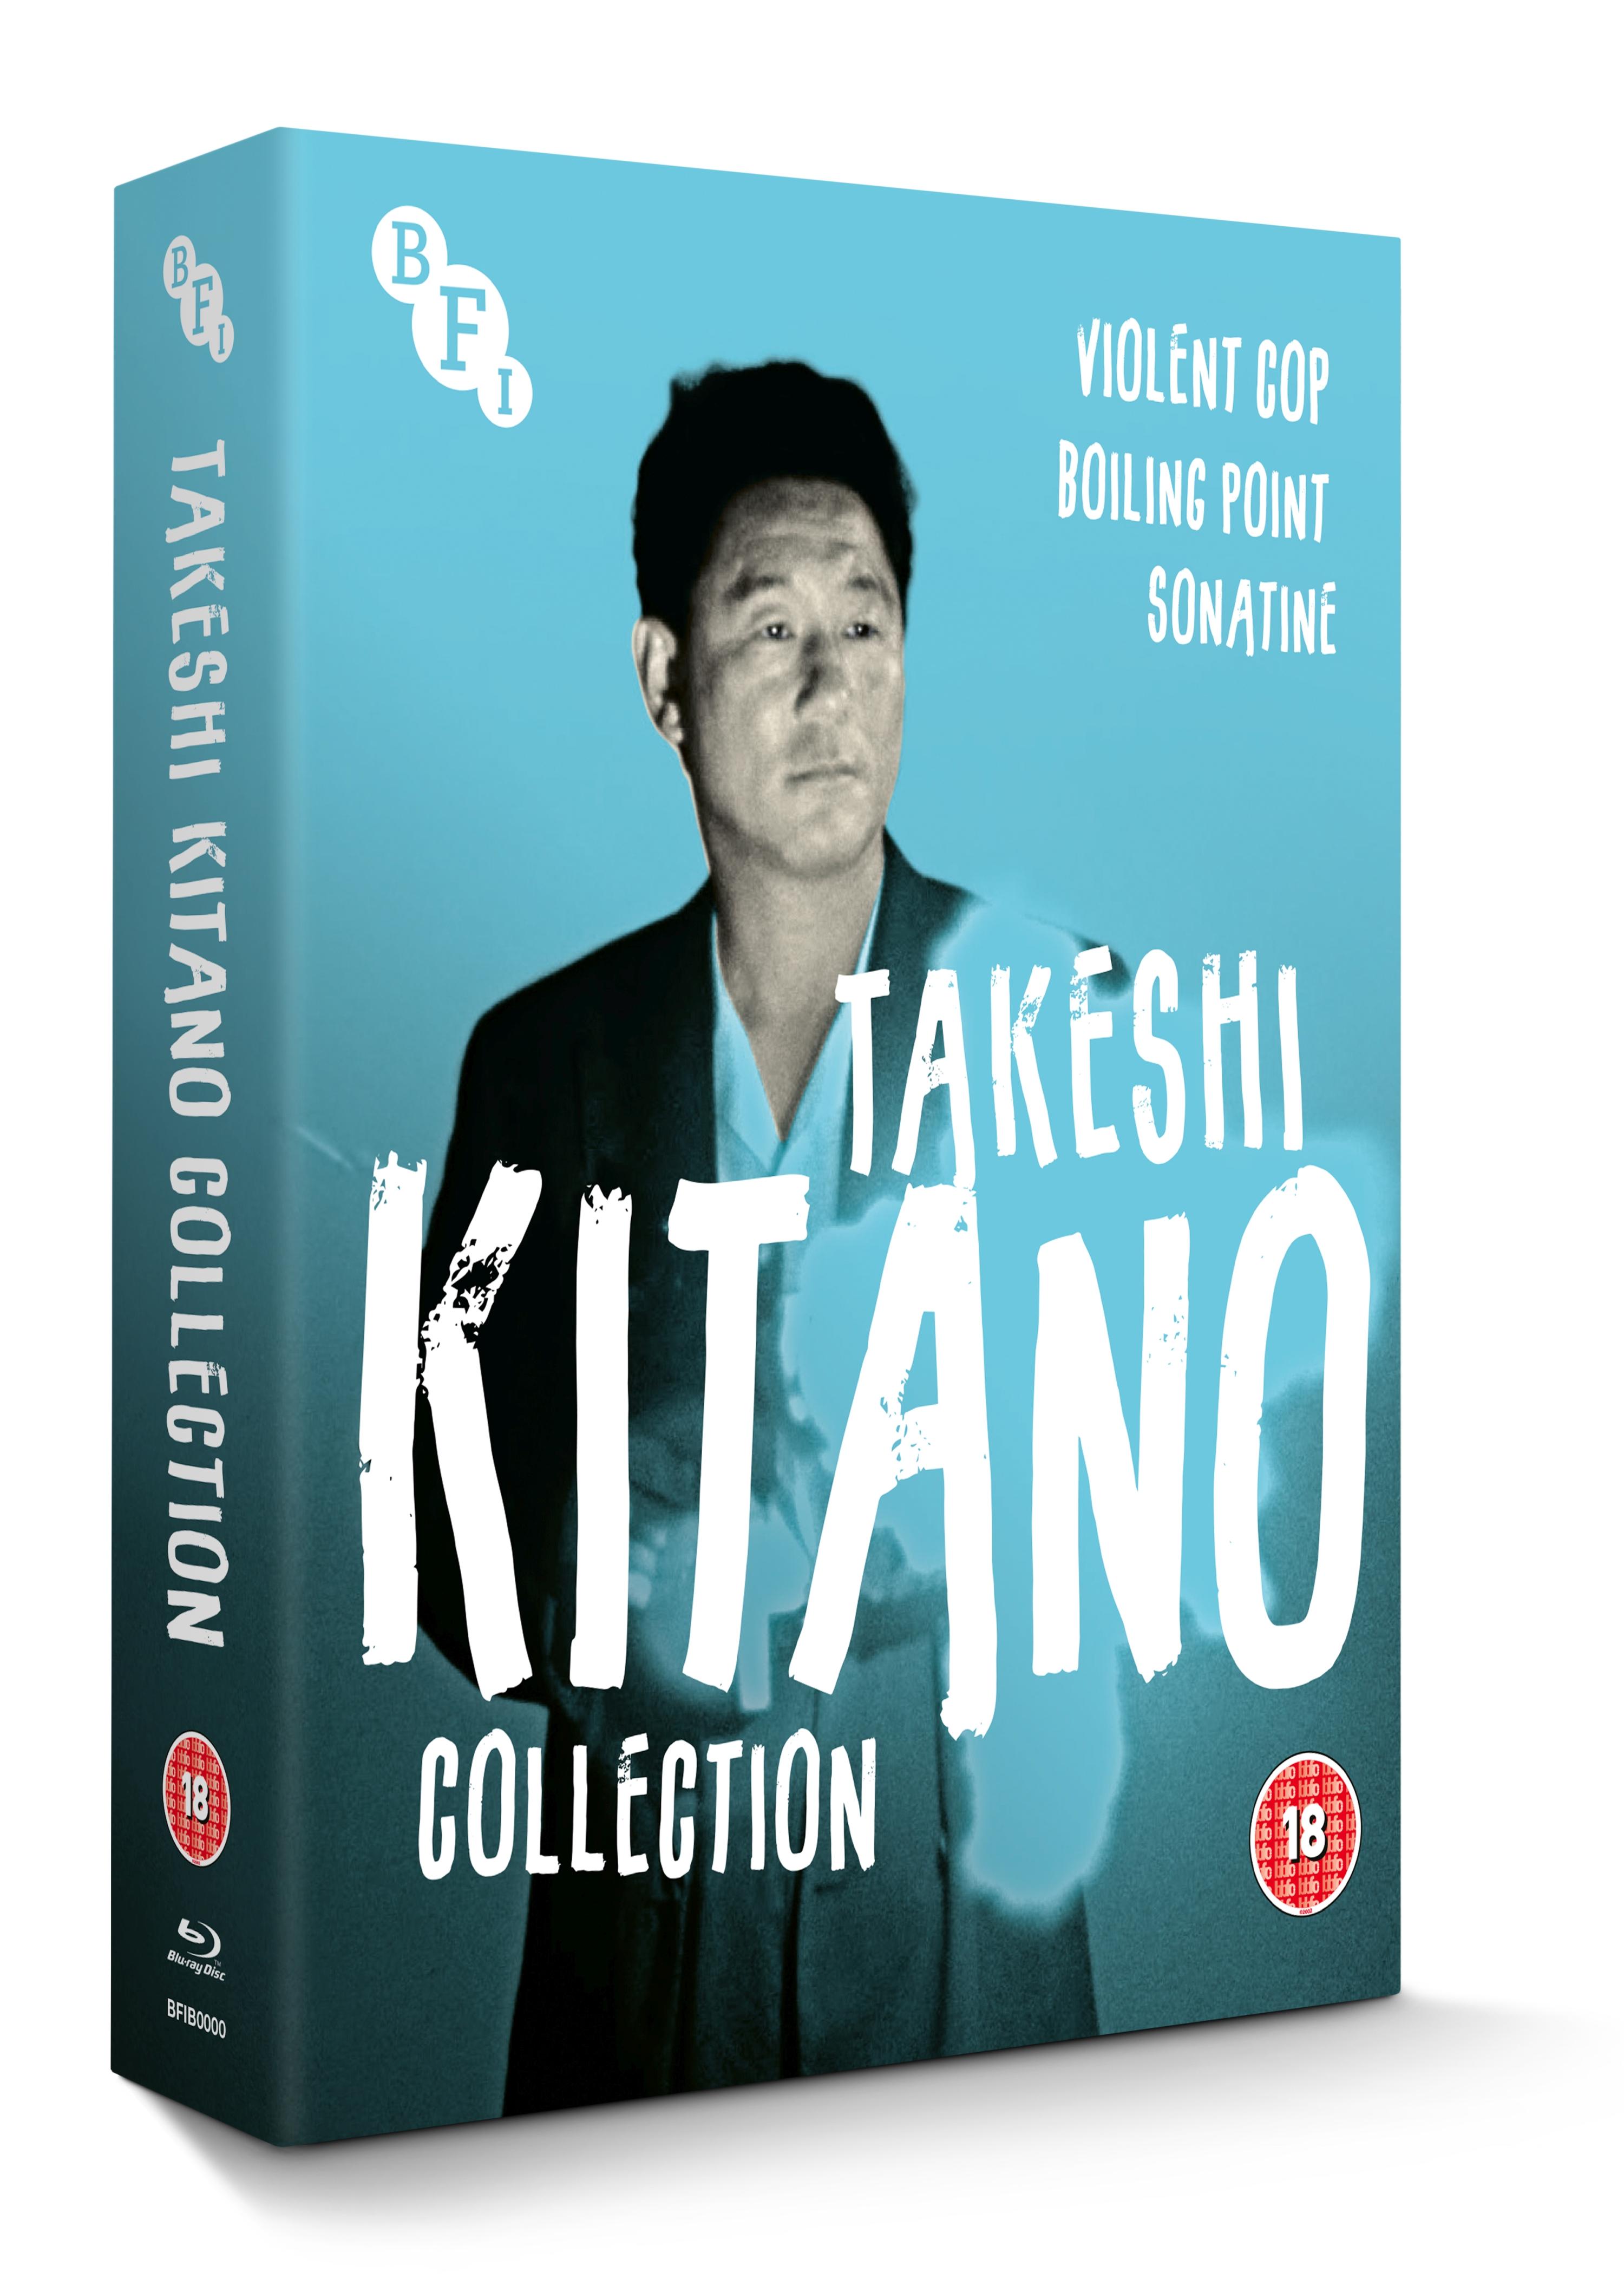 Buy PRE-ORDER Takeshi Kitano Collection (3-Disc Blu-ray Set)